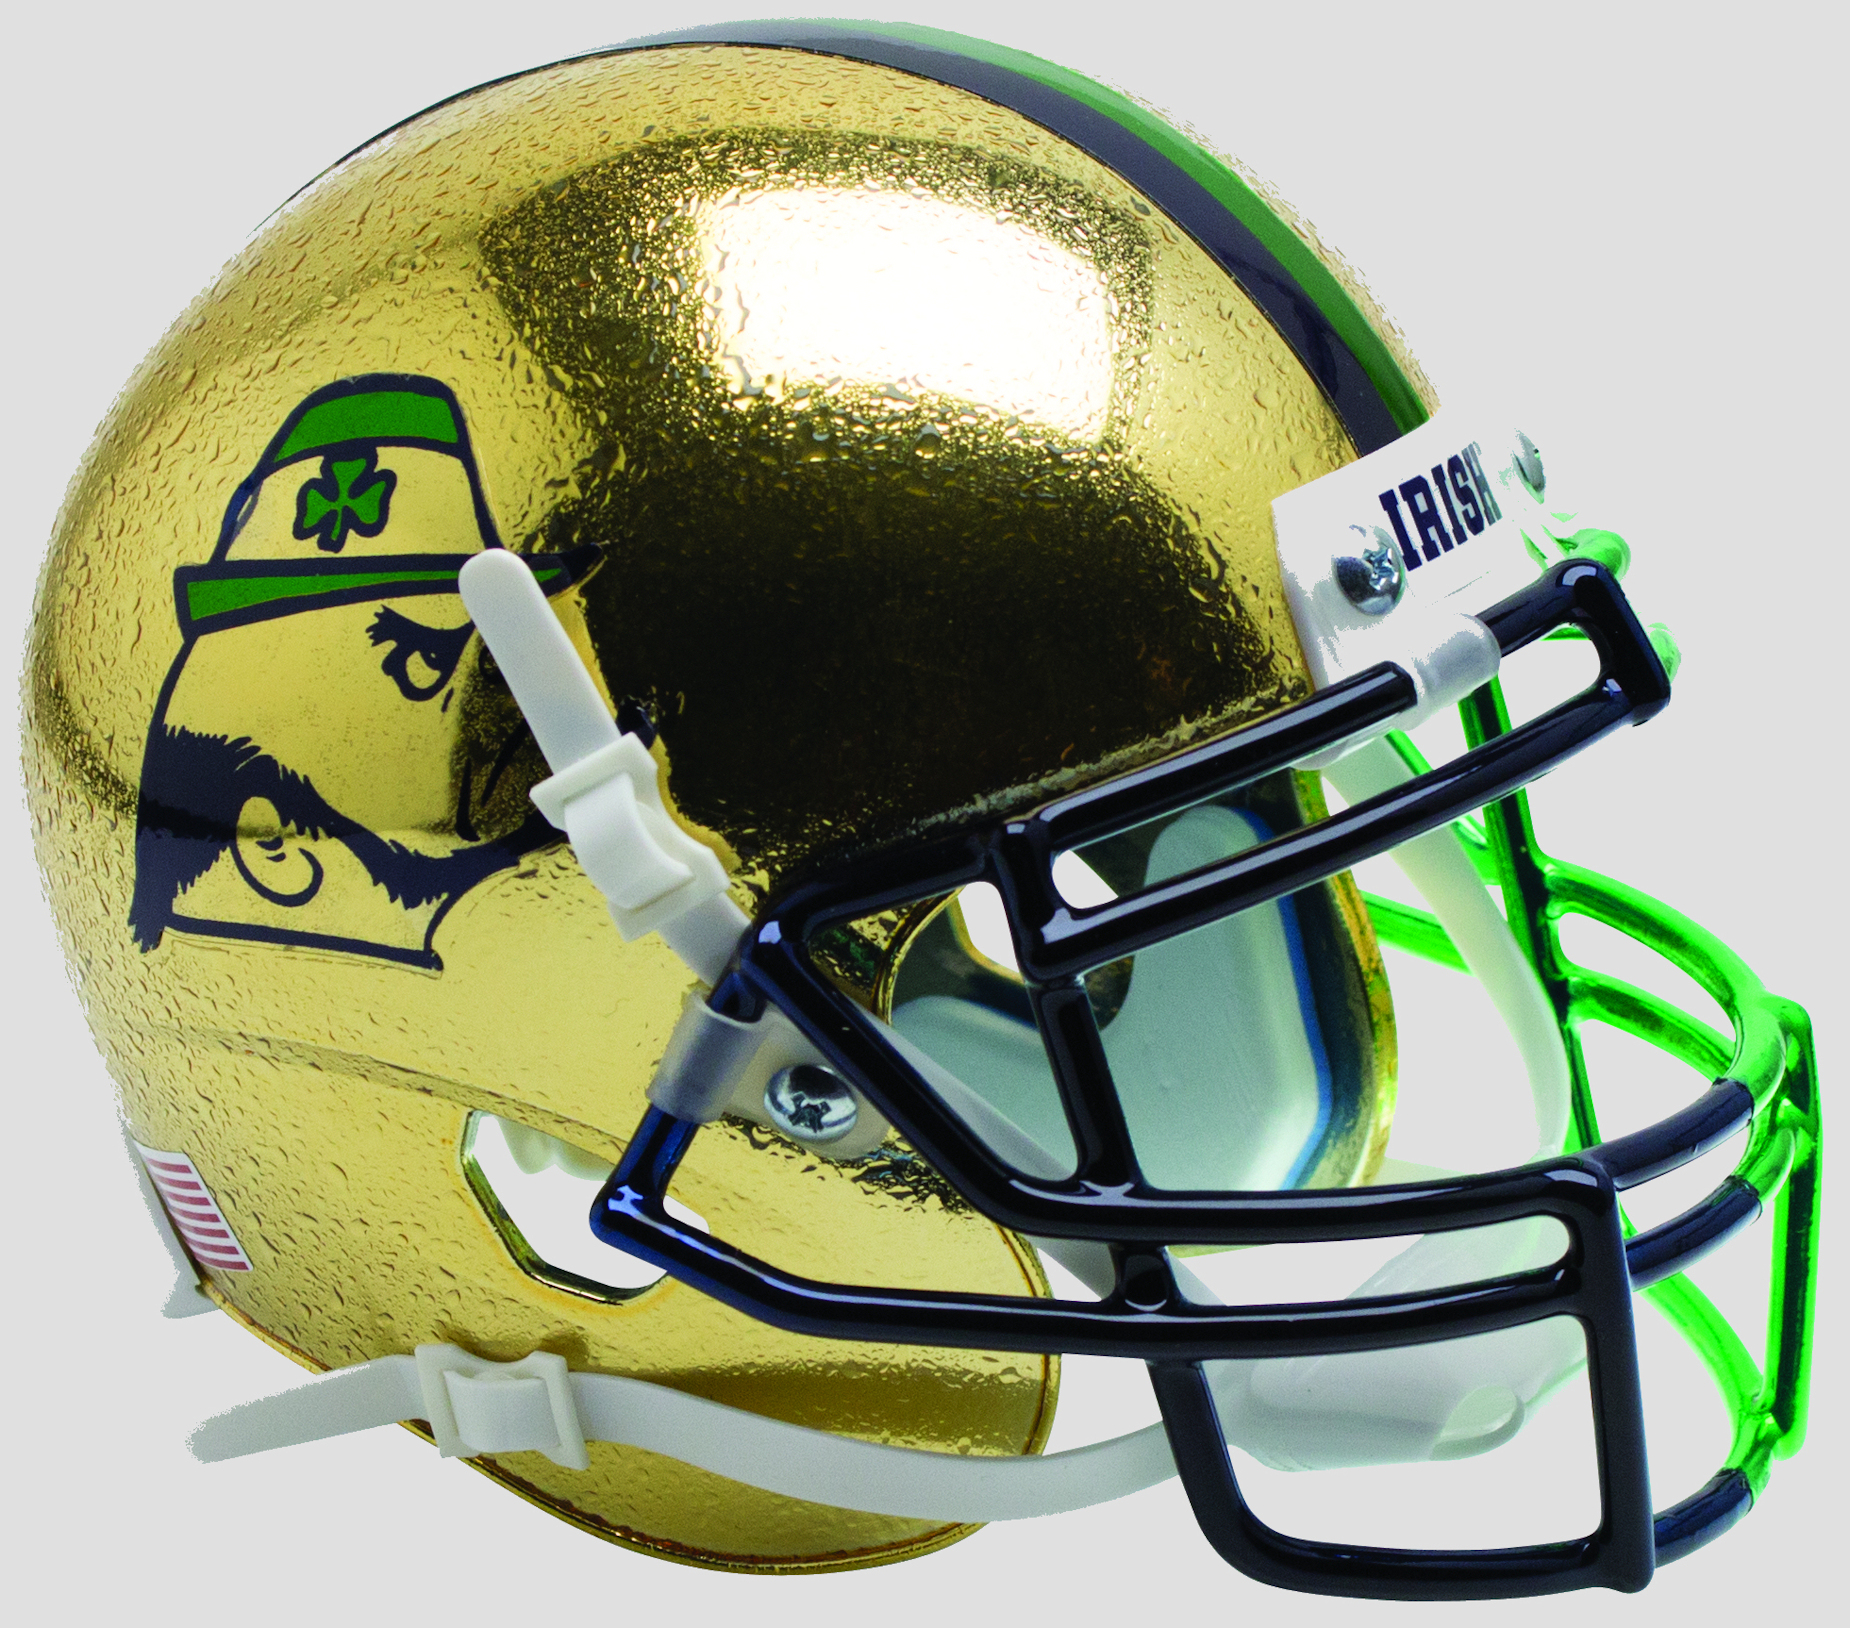 Notre Dame Fighting Irish Full XP Replica Football Helmet Schutt <B>Textured with Shamrock 2015 Boston</B>